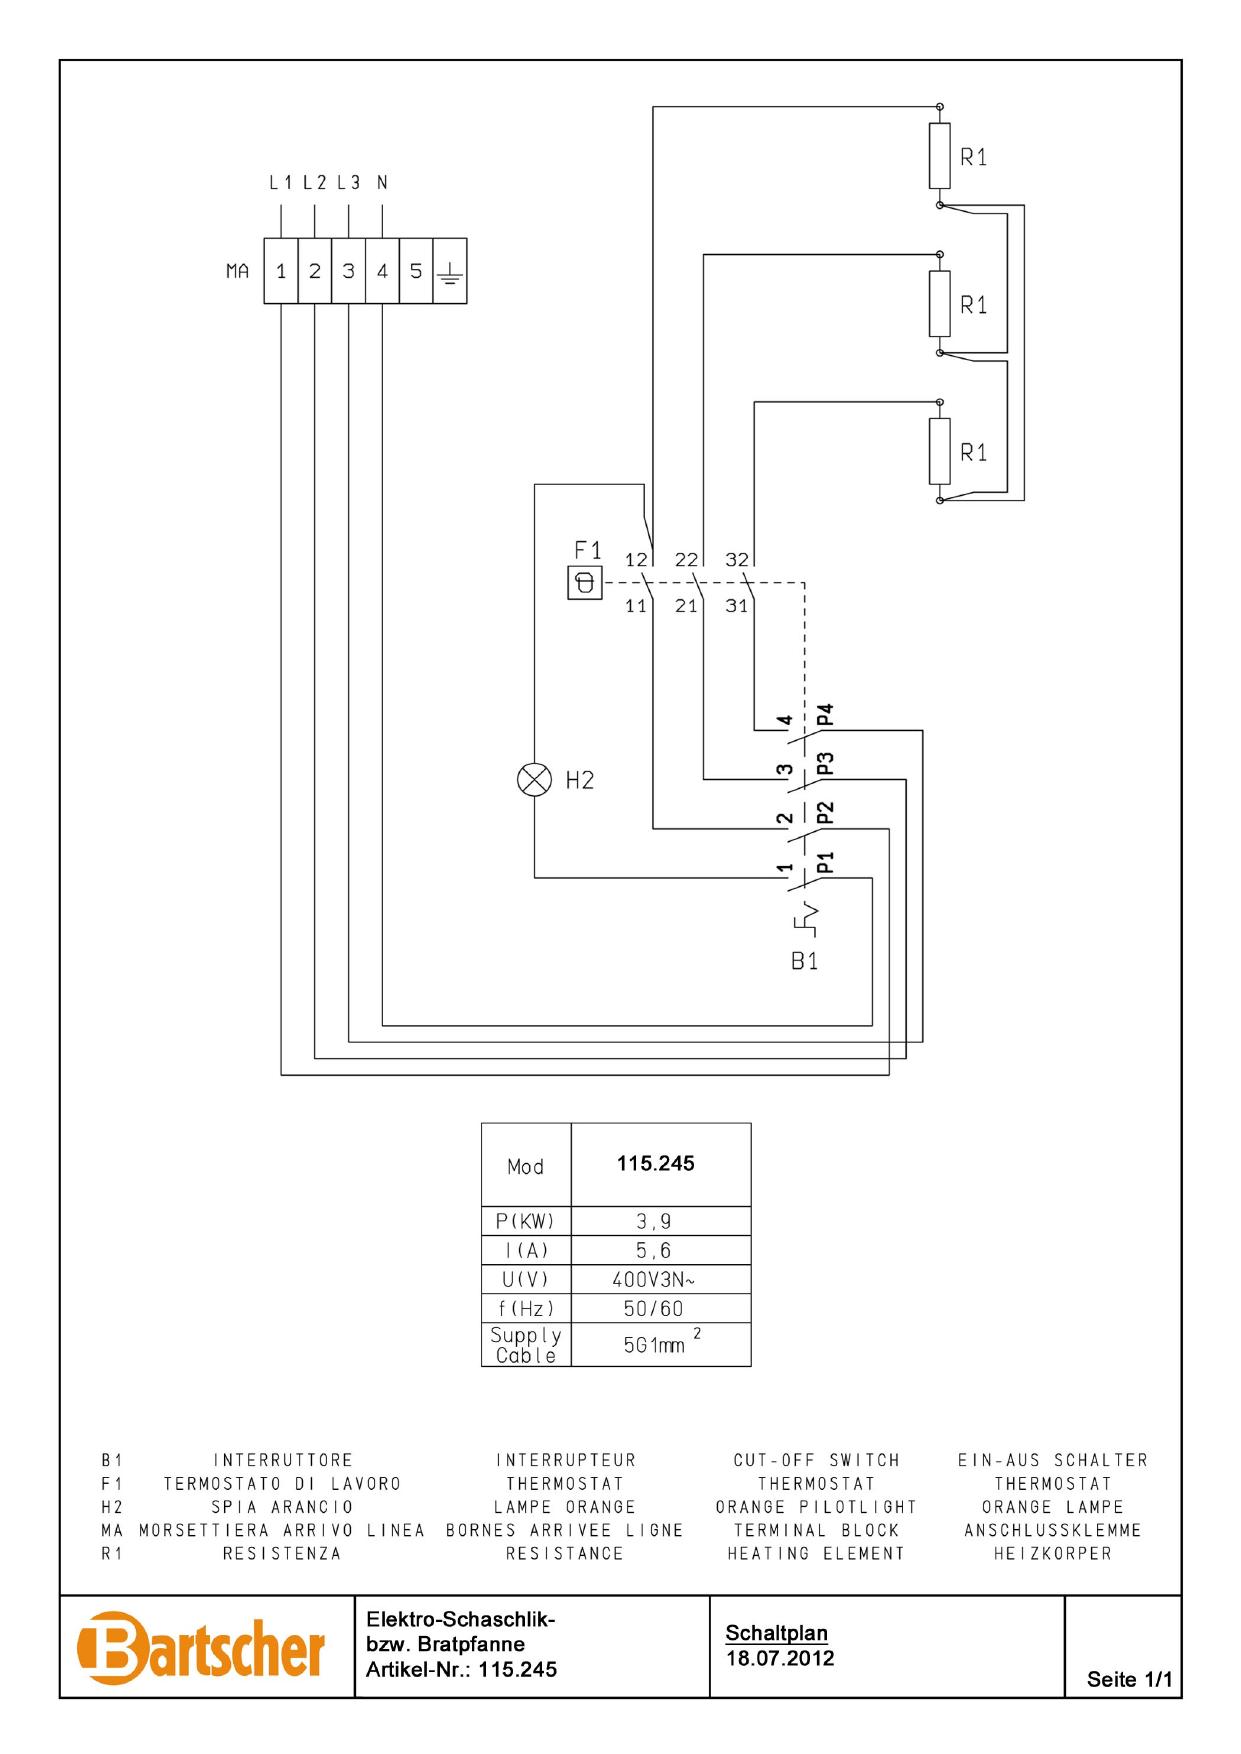 Bartscher 115245 Electric Frying Pan 650  12 5l W400